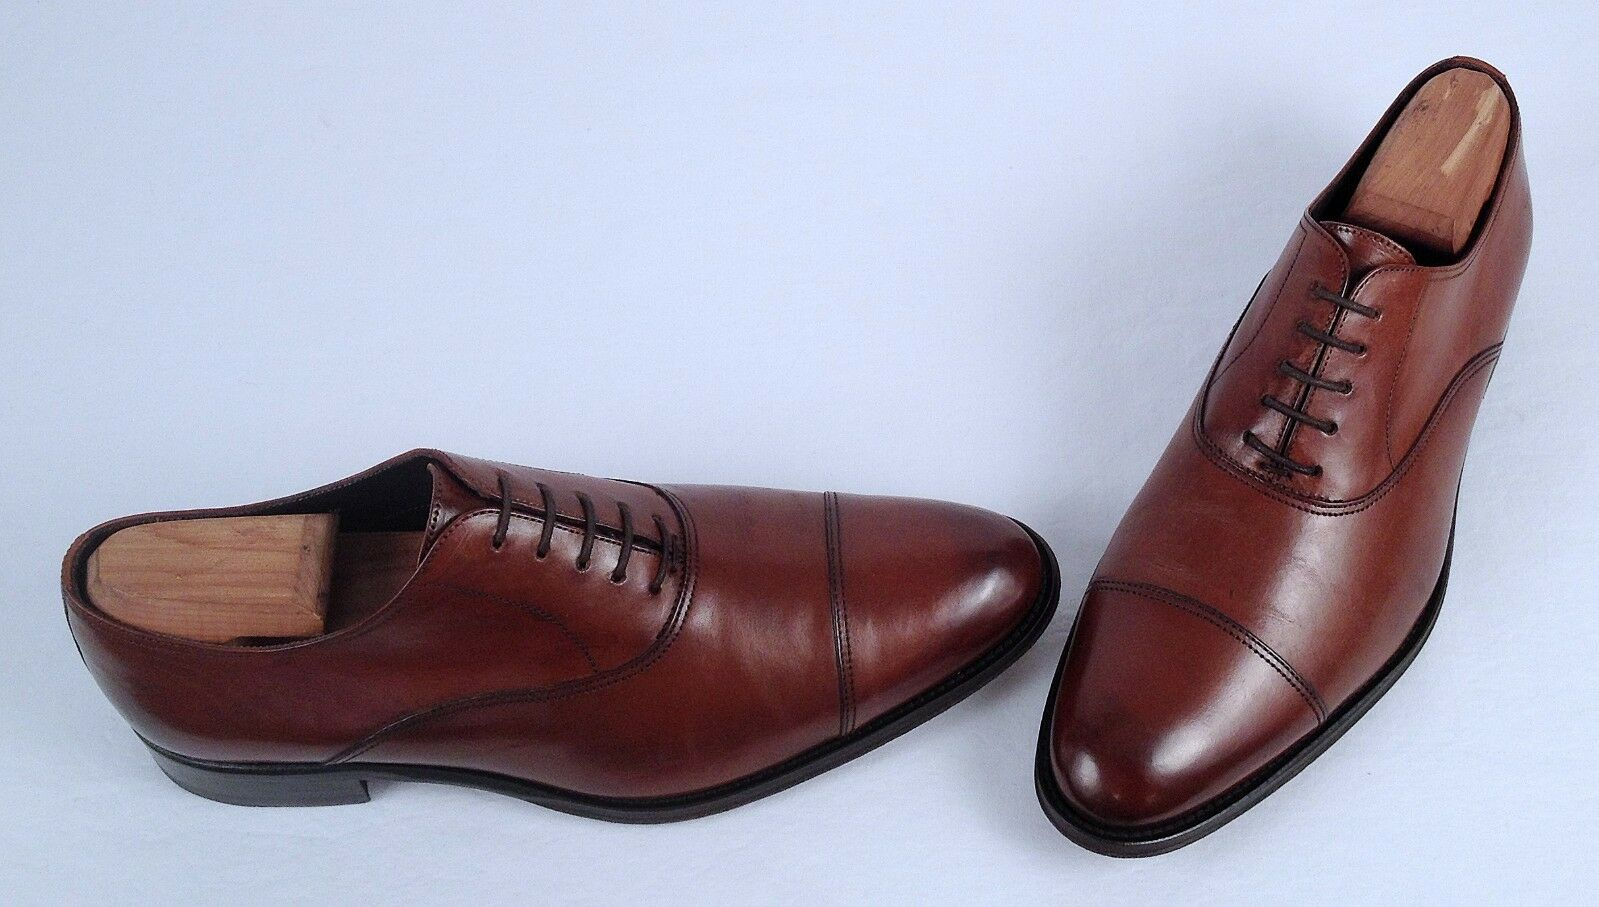 To Boot New York 'Brandon' Cap Toe Oxford- Cognac-Size 9 W- $375